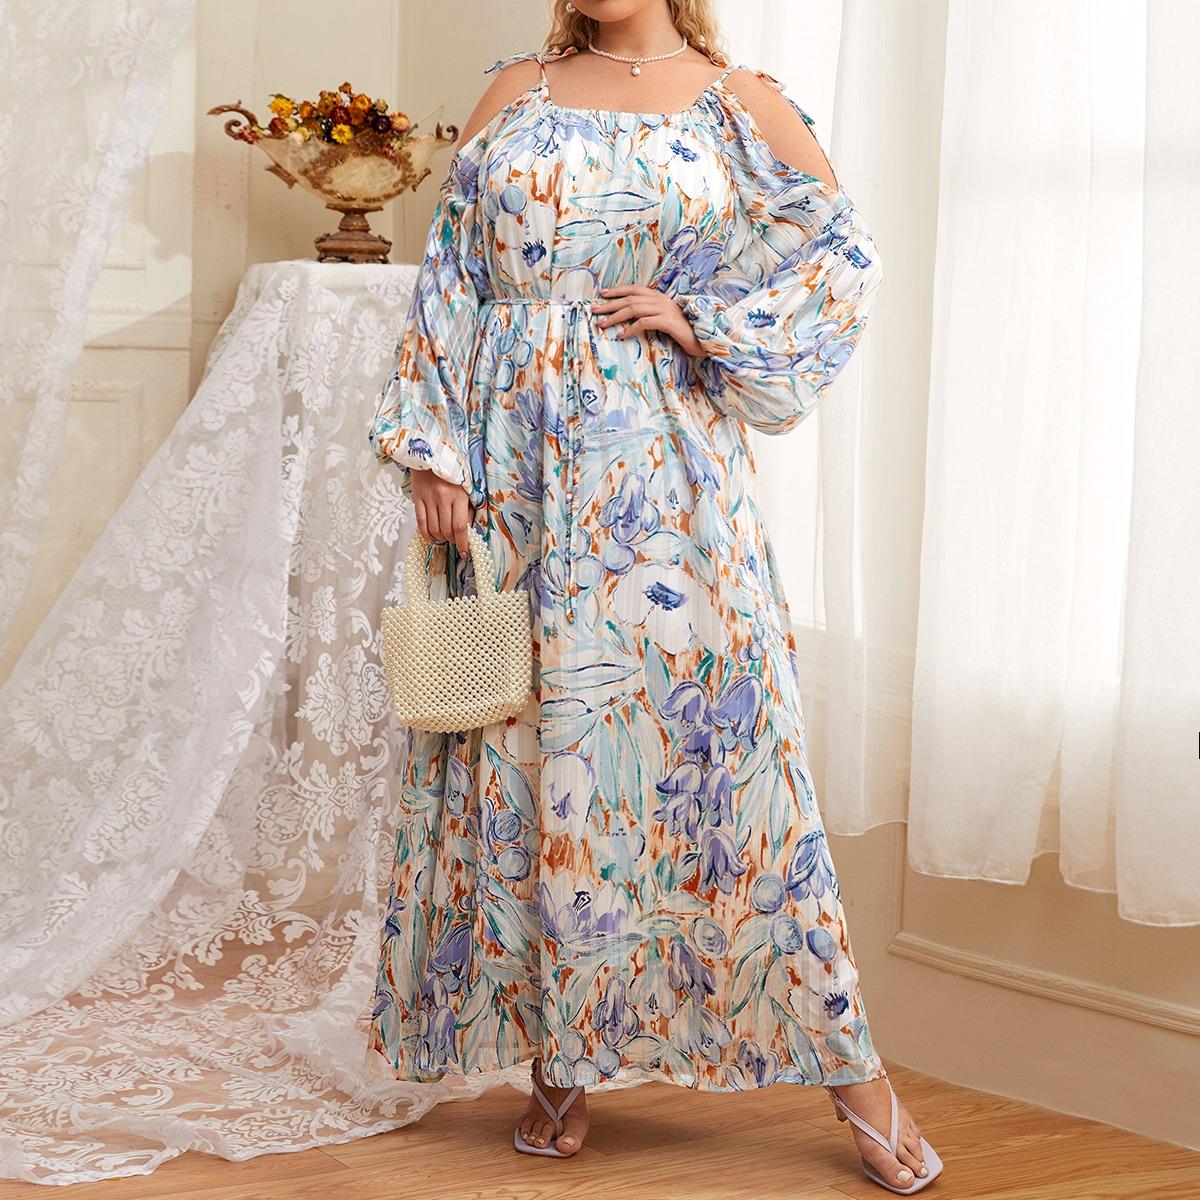 Plus Allover Floral Cold Shoulder Pleated Dress